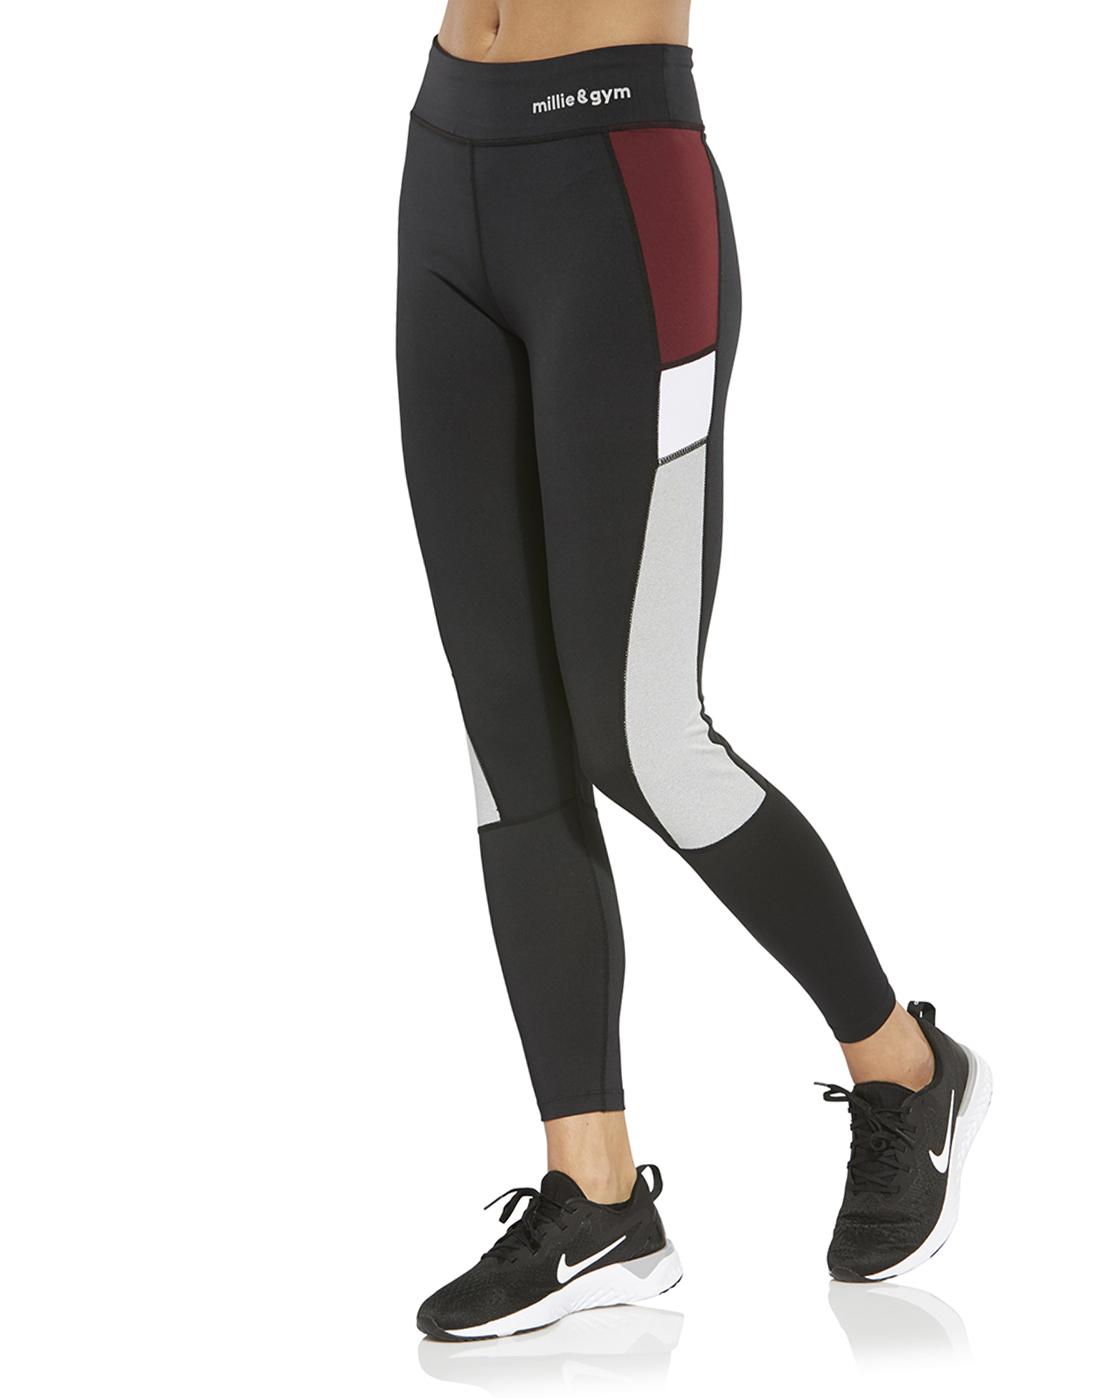 3659d2cd4c27b millie & gym Womens Steph Leggings | Life Style Sports